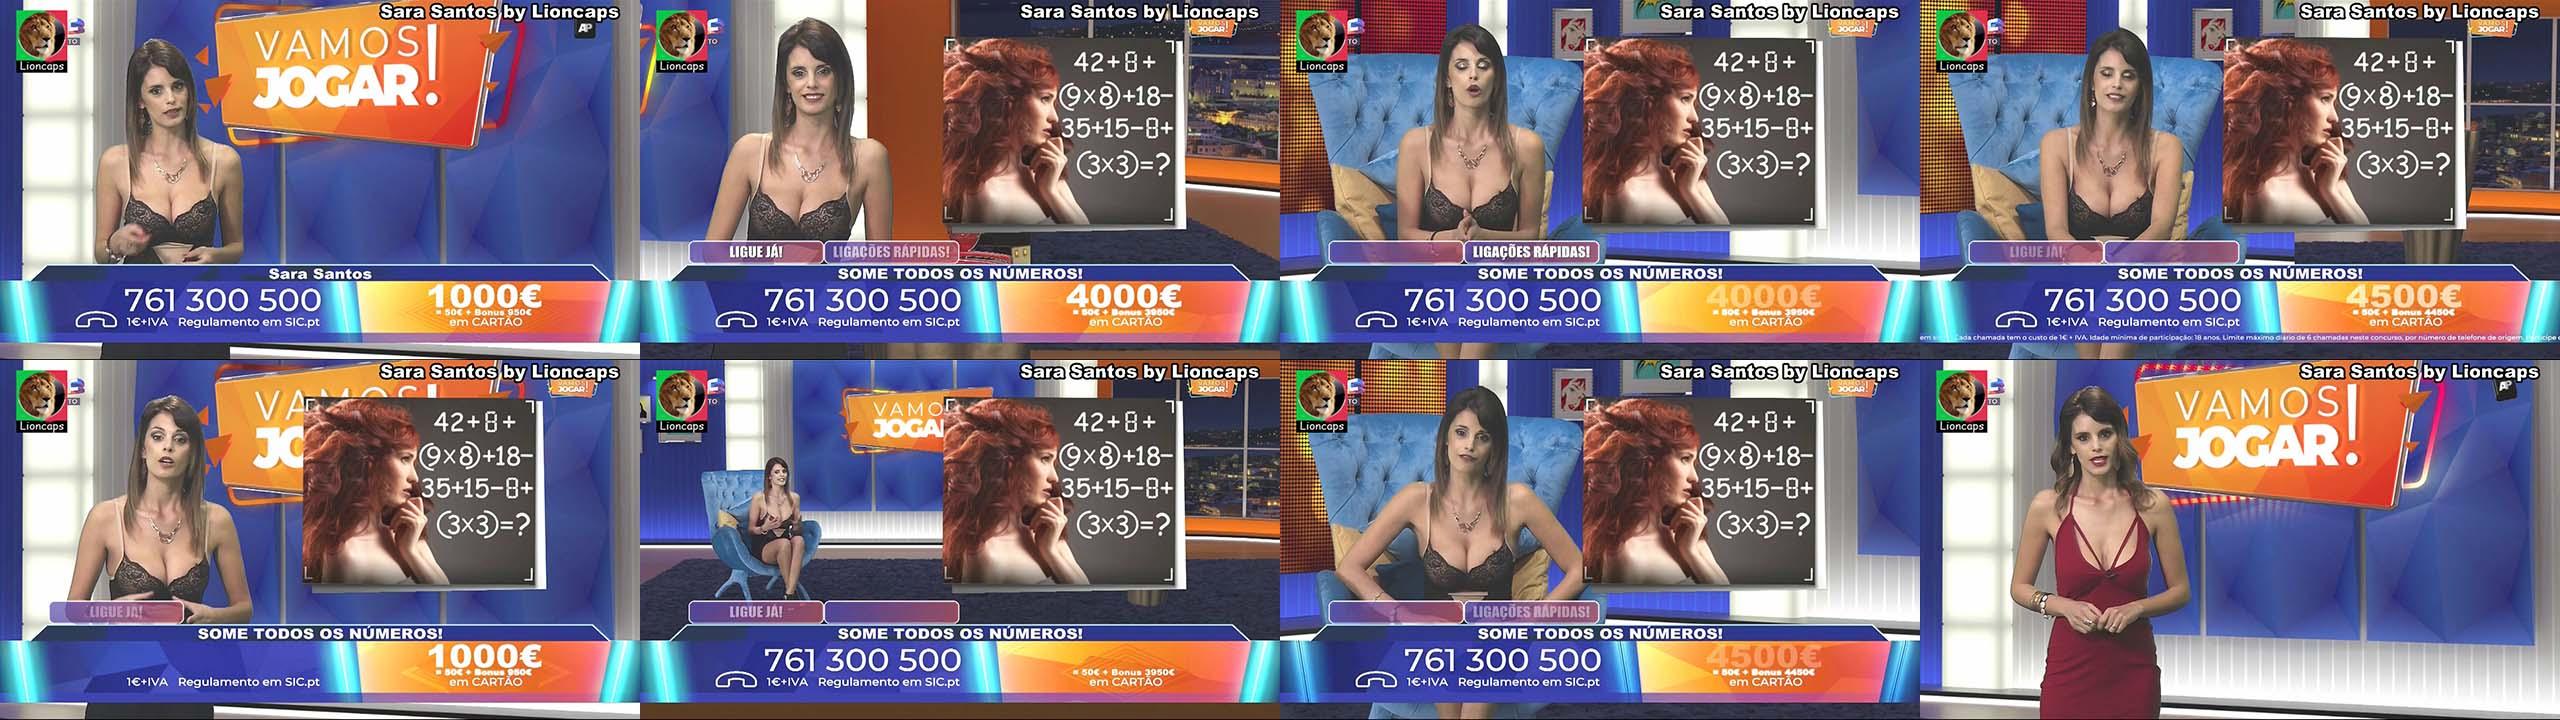 112542549_sara_santos_jogar_1080_lioncaps_07_04_2019_02_122_451lo.jpg